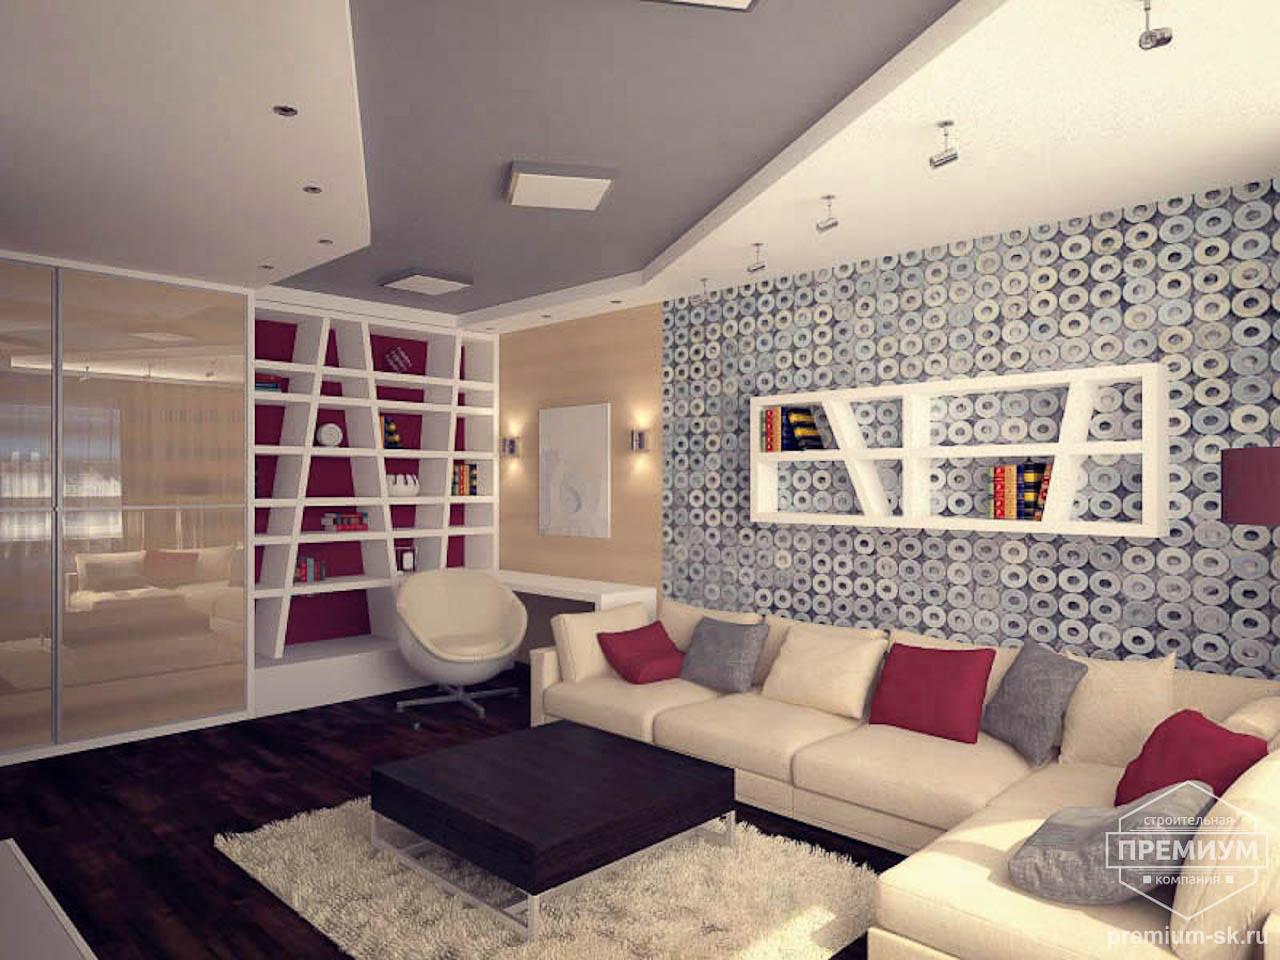 Дизайн интерьера однокомнатной квартиры по ул. Сыромолотова 11 img1305626655